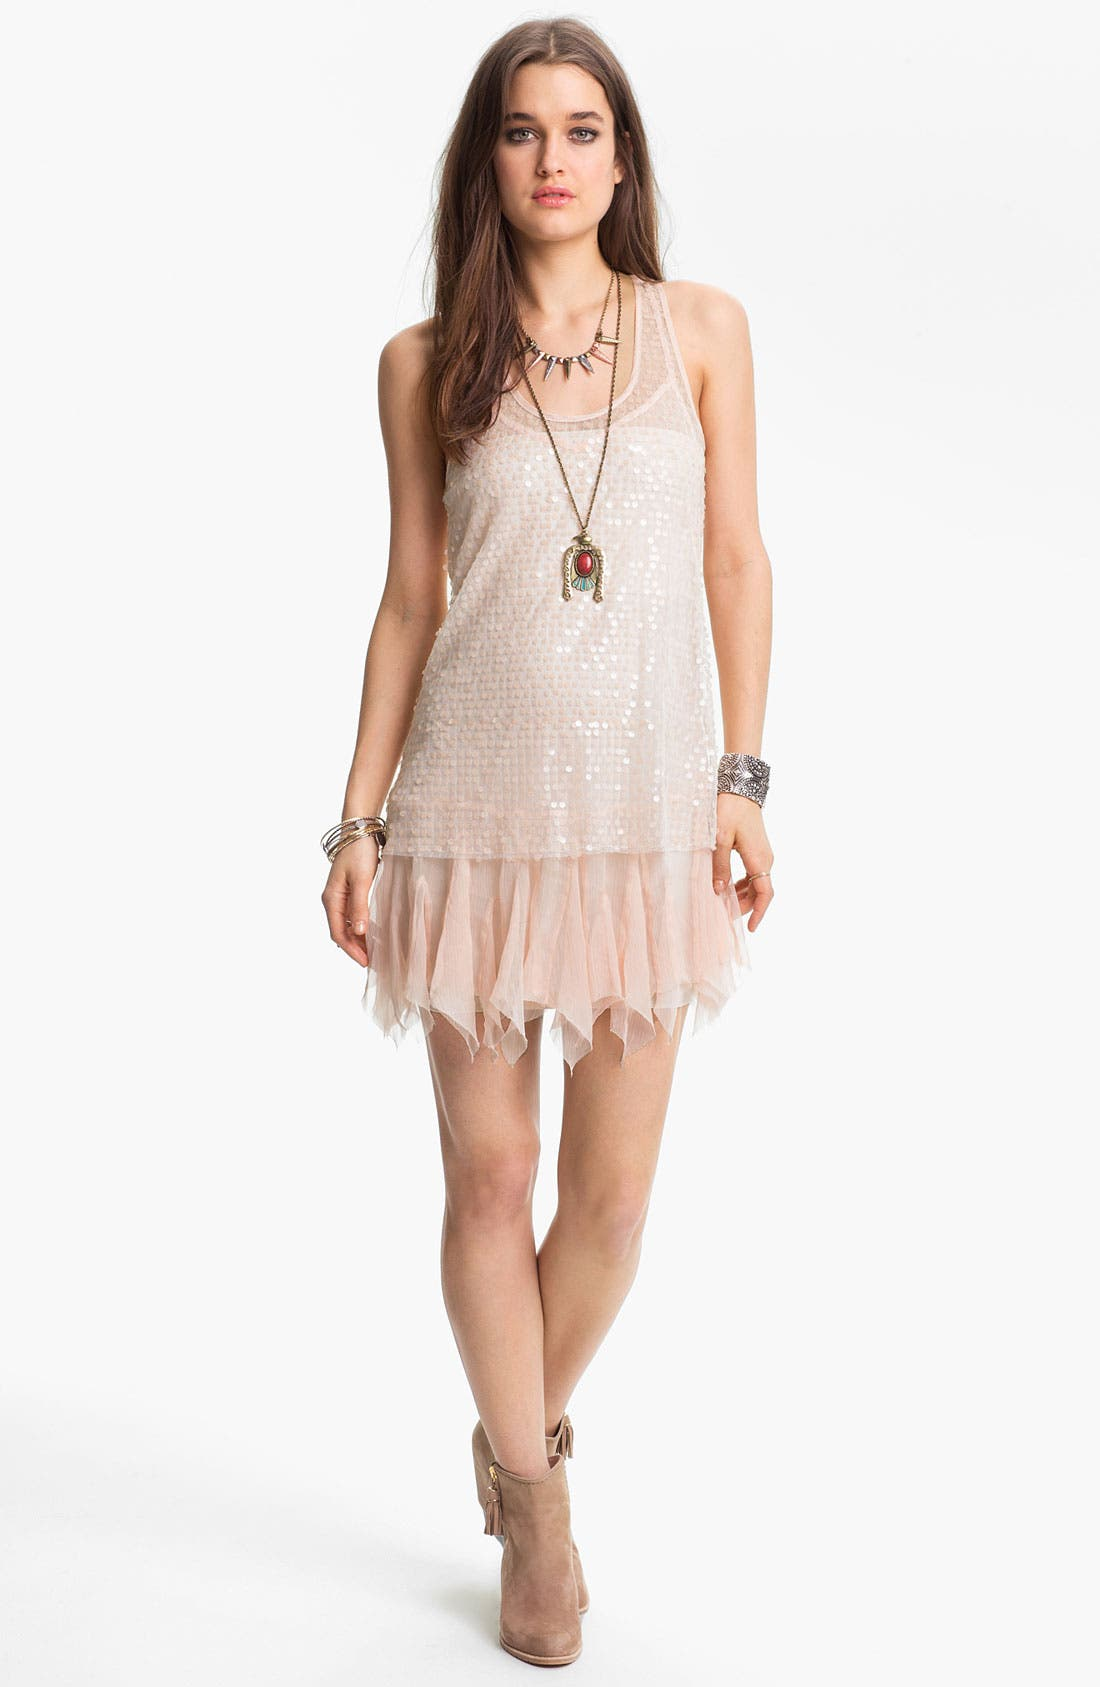 Alternate Image 1 Selected - Free People Sheer Sequin Slipdress